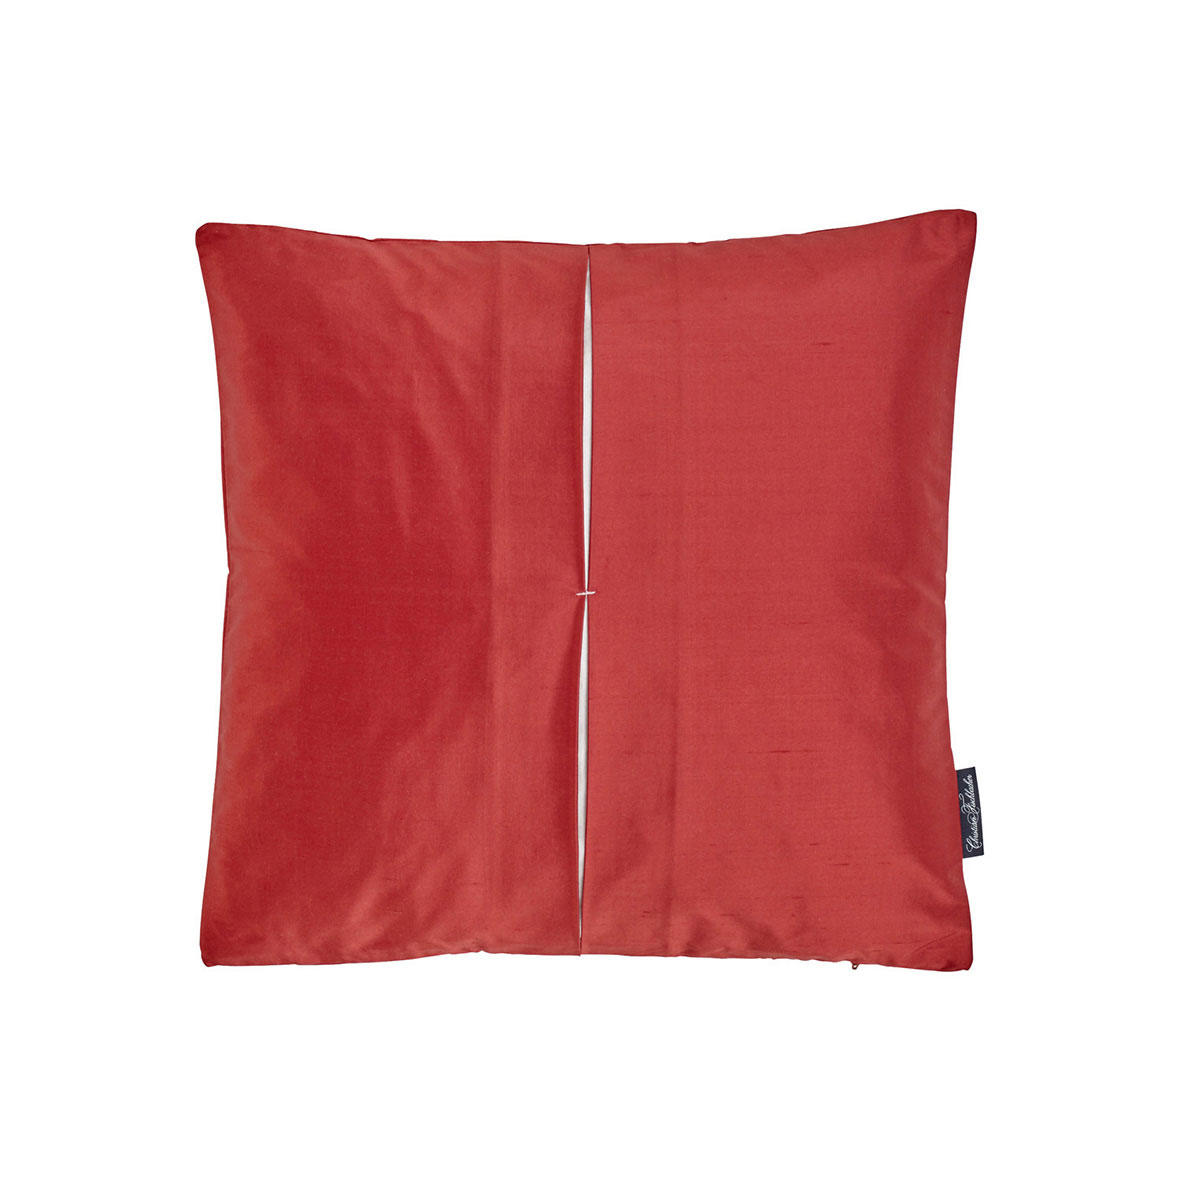 Zierkissen Jamila - Seide - Farbe rot - Christian Fischbacher